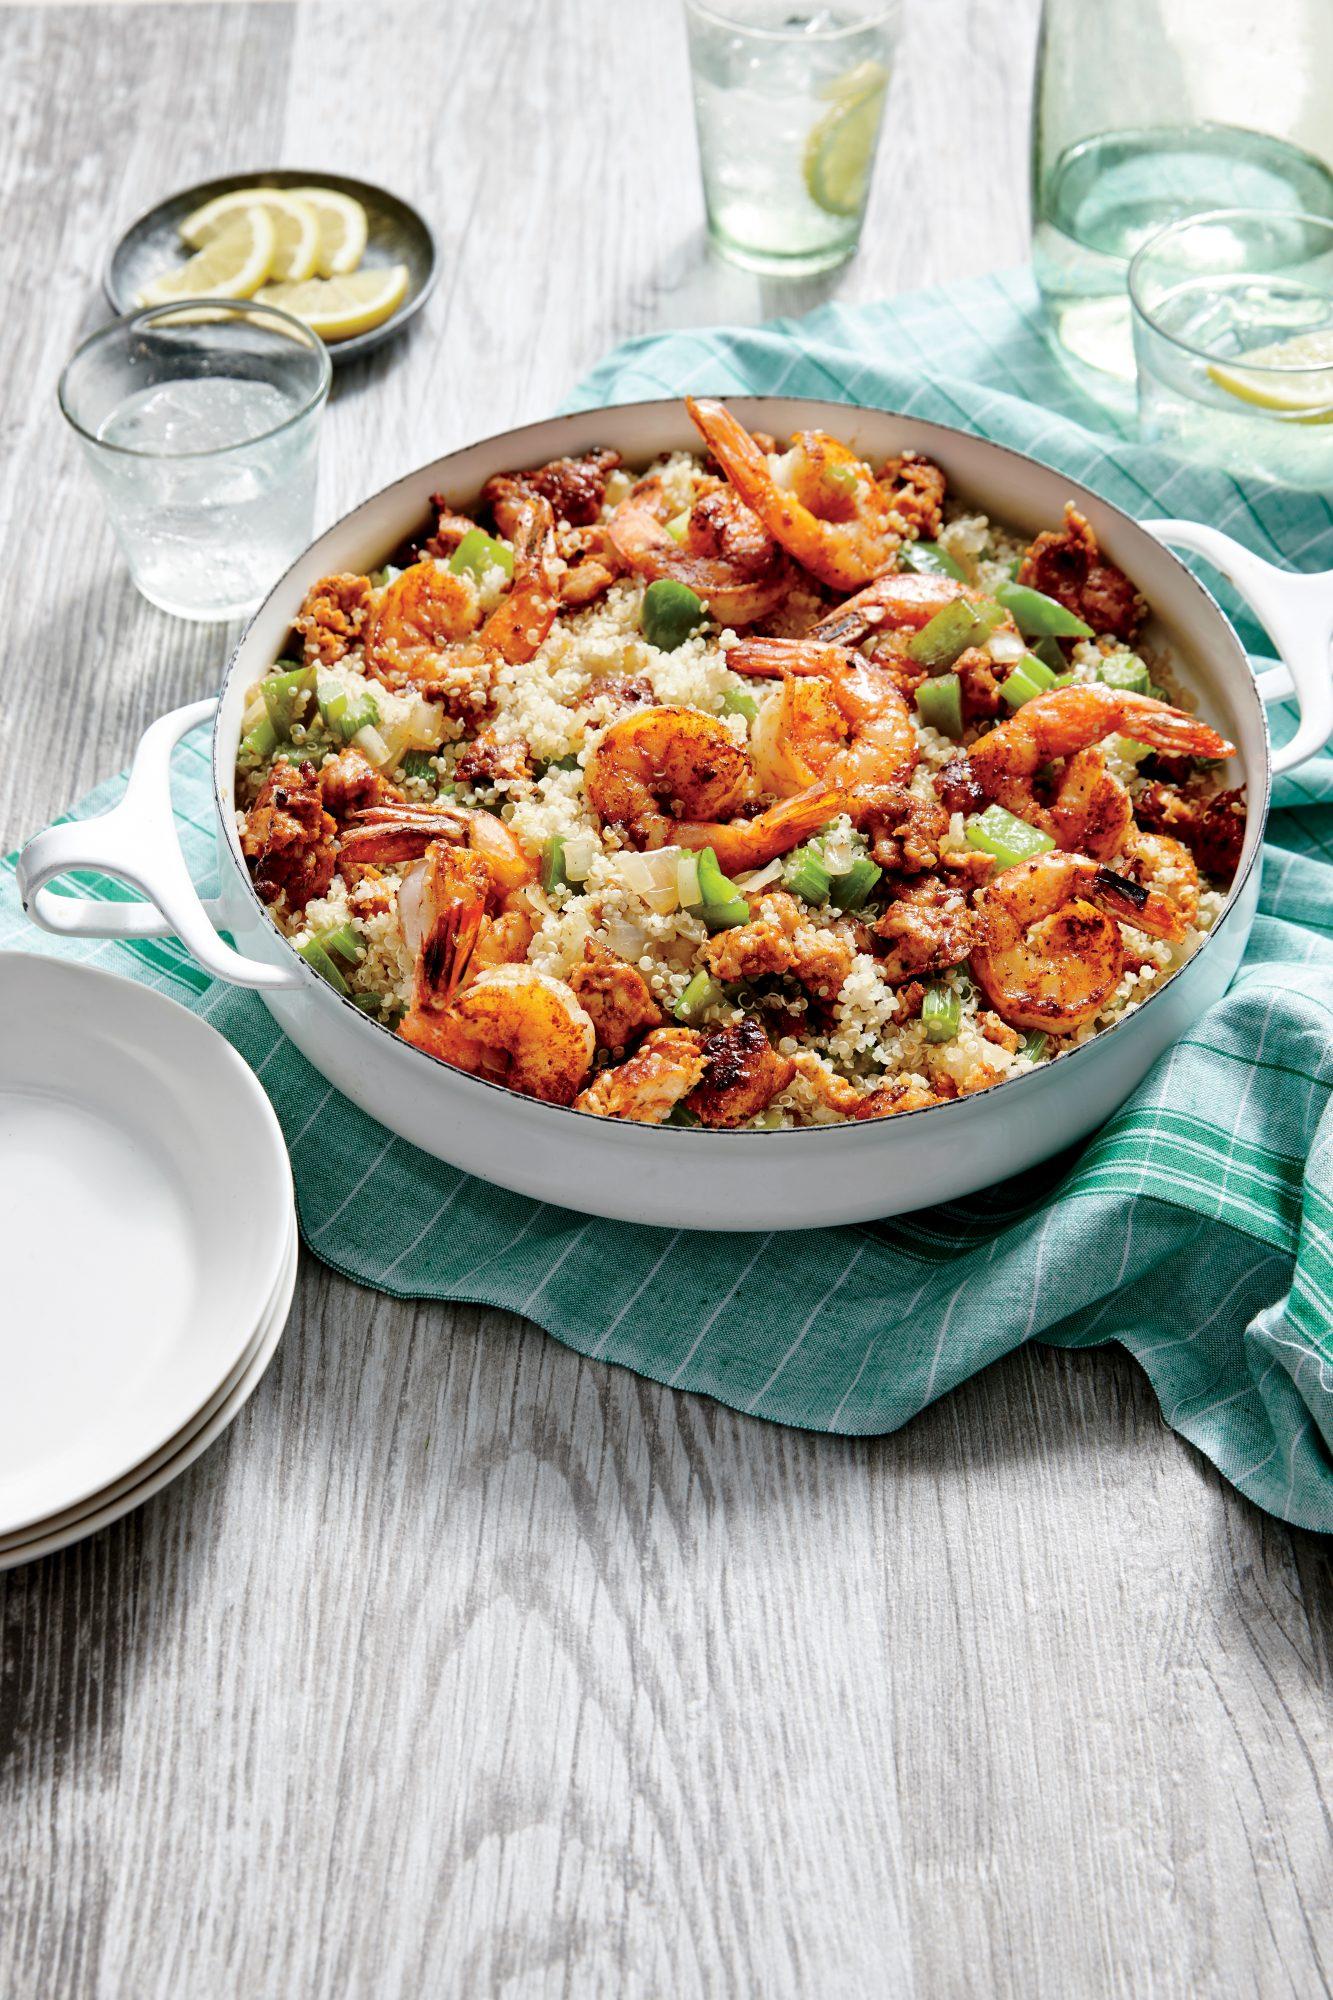 Sausage, Shrimp & Quinoa Skillet